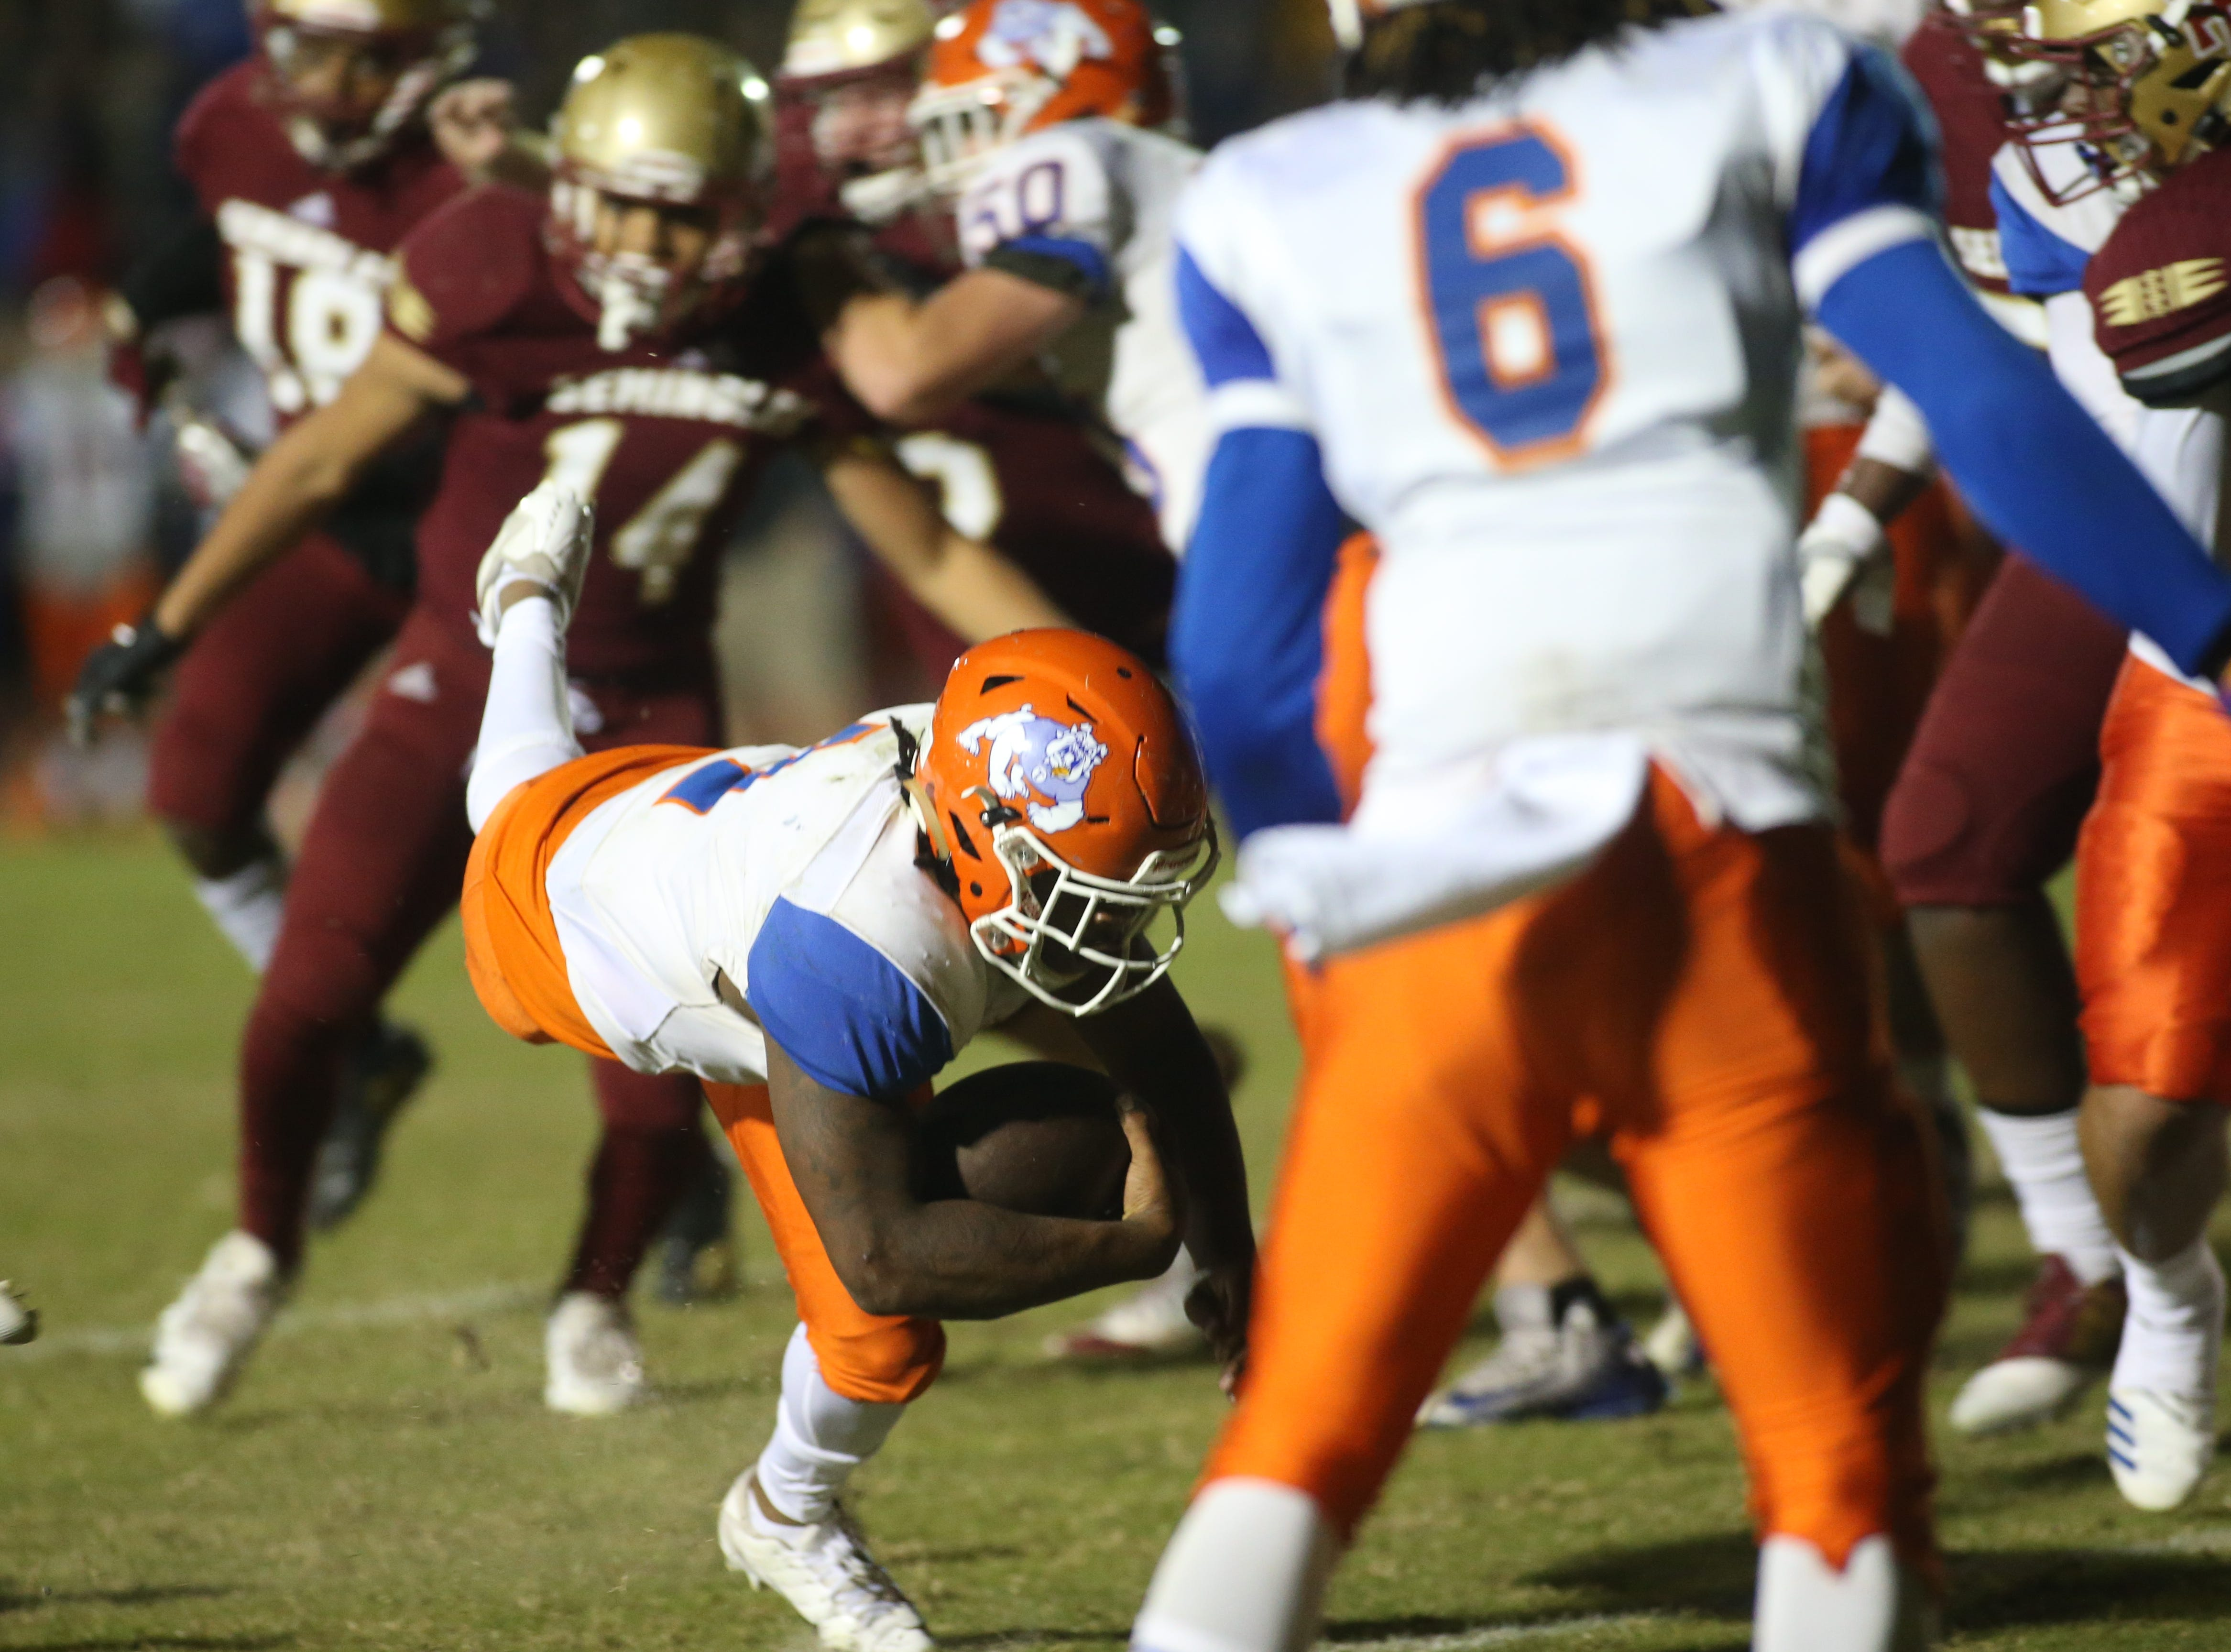 Taylor County Bulldog quarterback Da'corian Bellamy (1) stumbles in for a touchdown as the Taylor County Bulldogs play the Florida High Seminoles in a Region 1-3A final on Friday, Nov. 23, 2018.